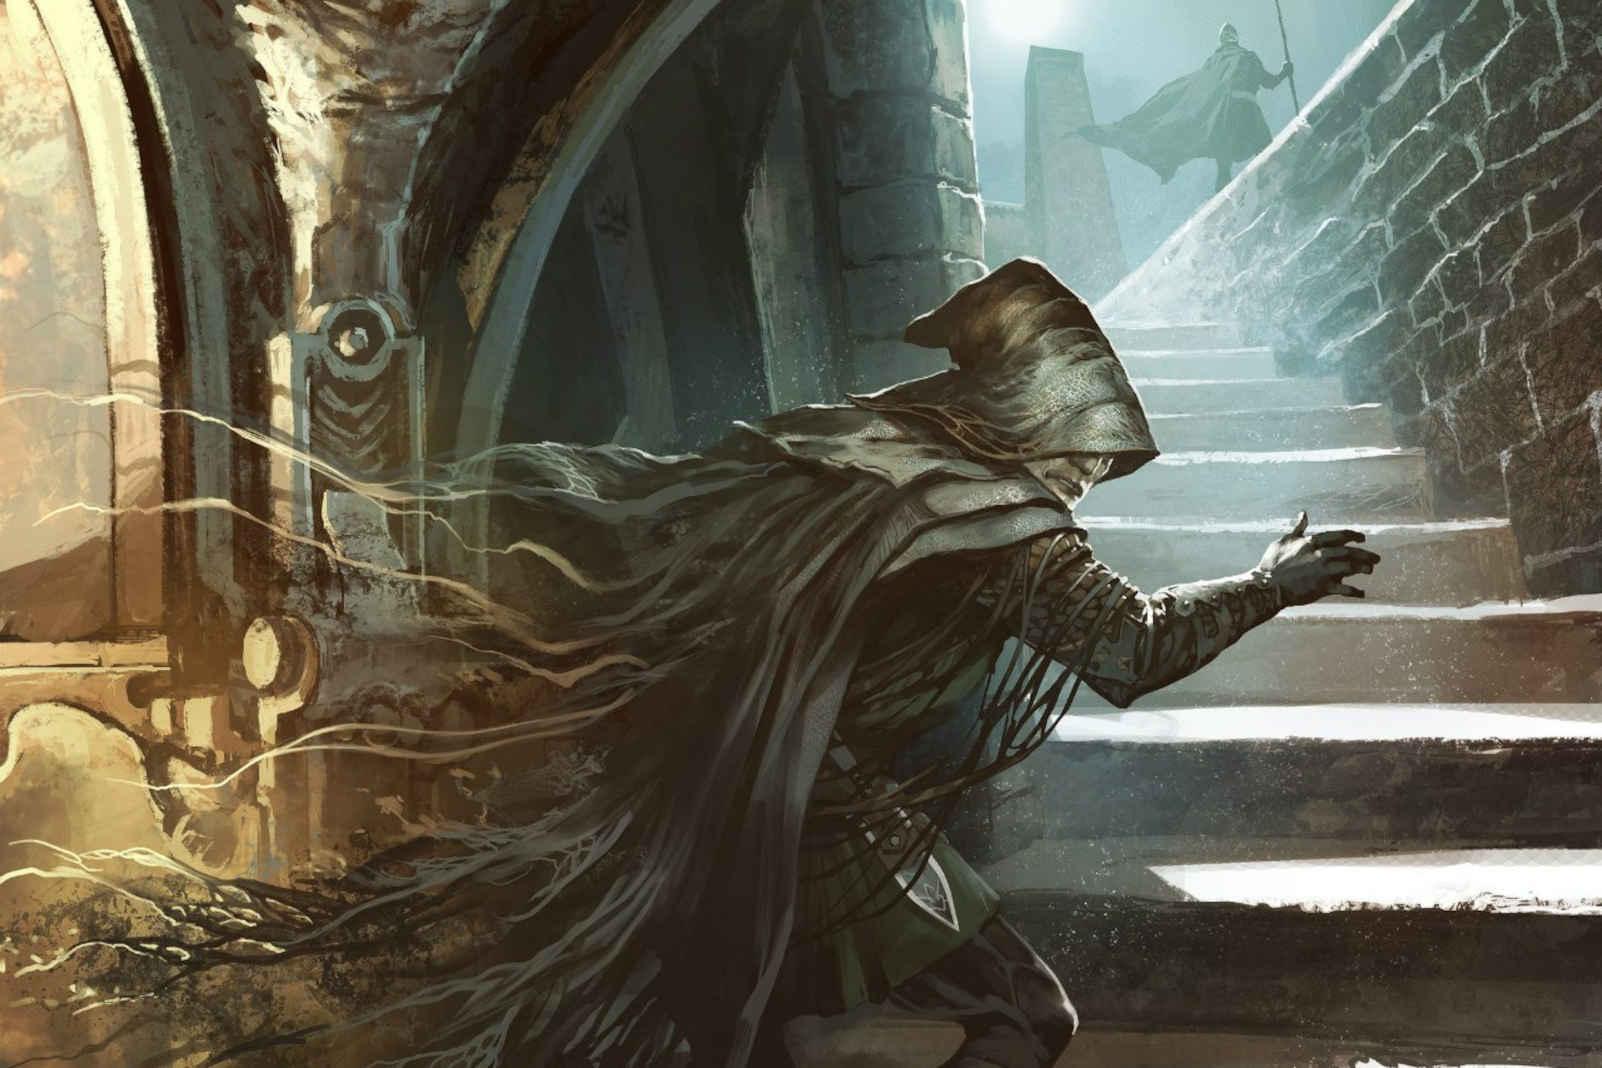 Shadowmage Infiltrator MTG Fear card illustration. Copyright: Wizards of the Coast. Artist: Thomasz Jedruszek.